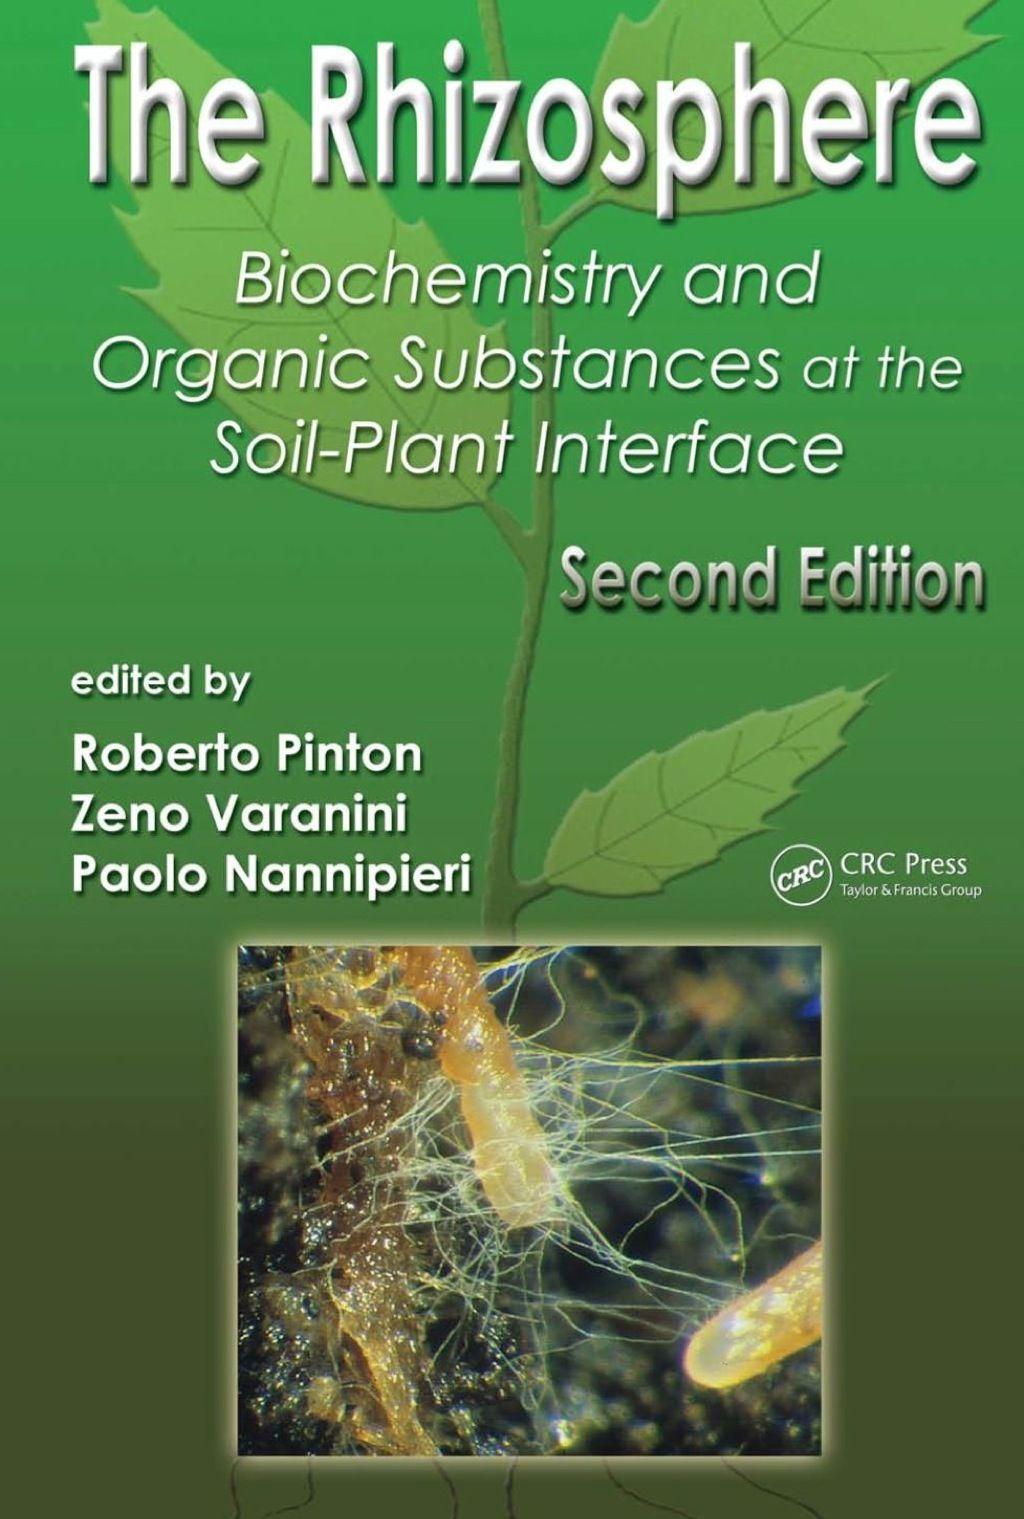 The Rhizosphere Ebook Rental Biochemistry Free Ebooks Download